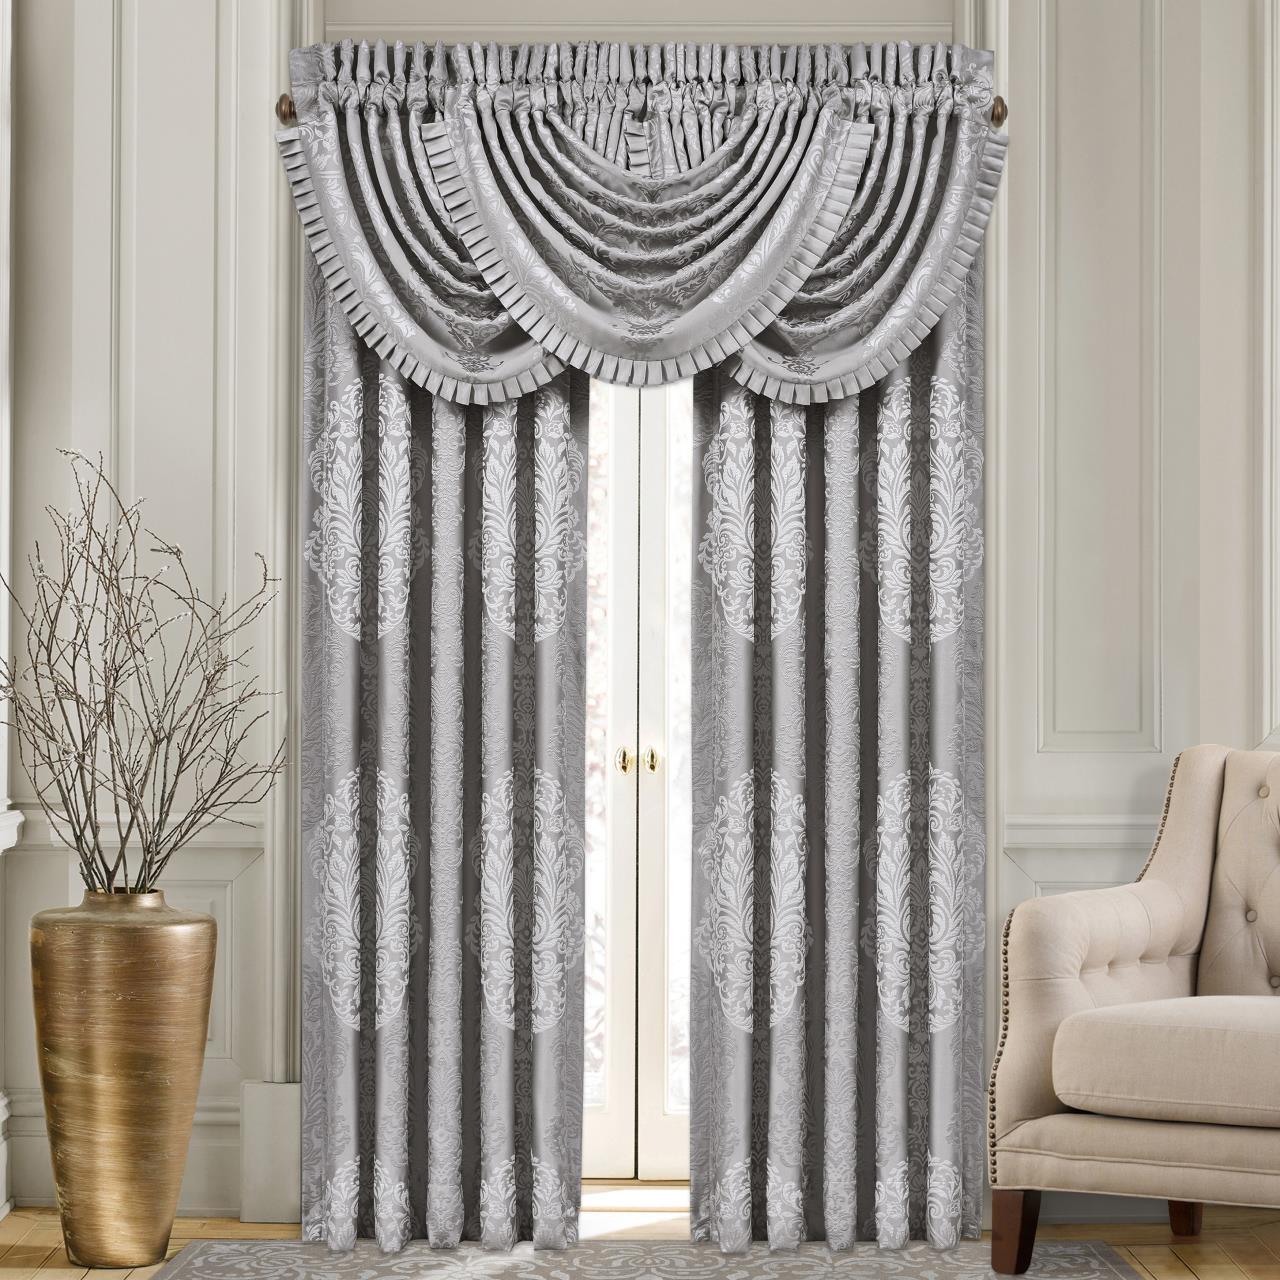 La Scala Silver Curtains2 - 846339085574